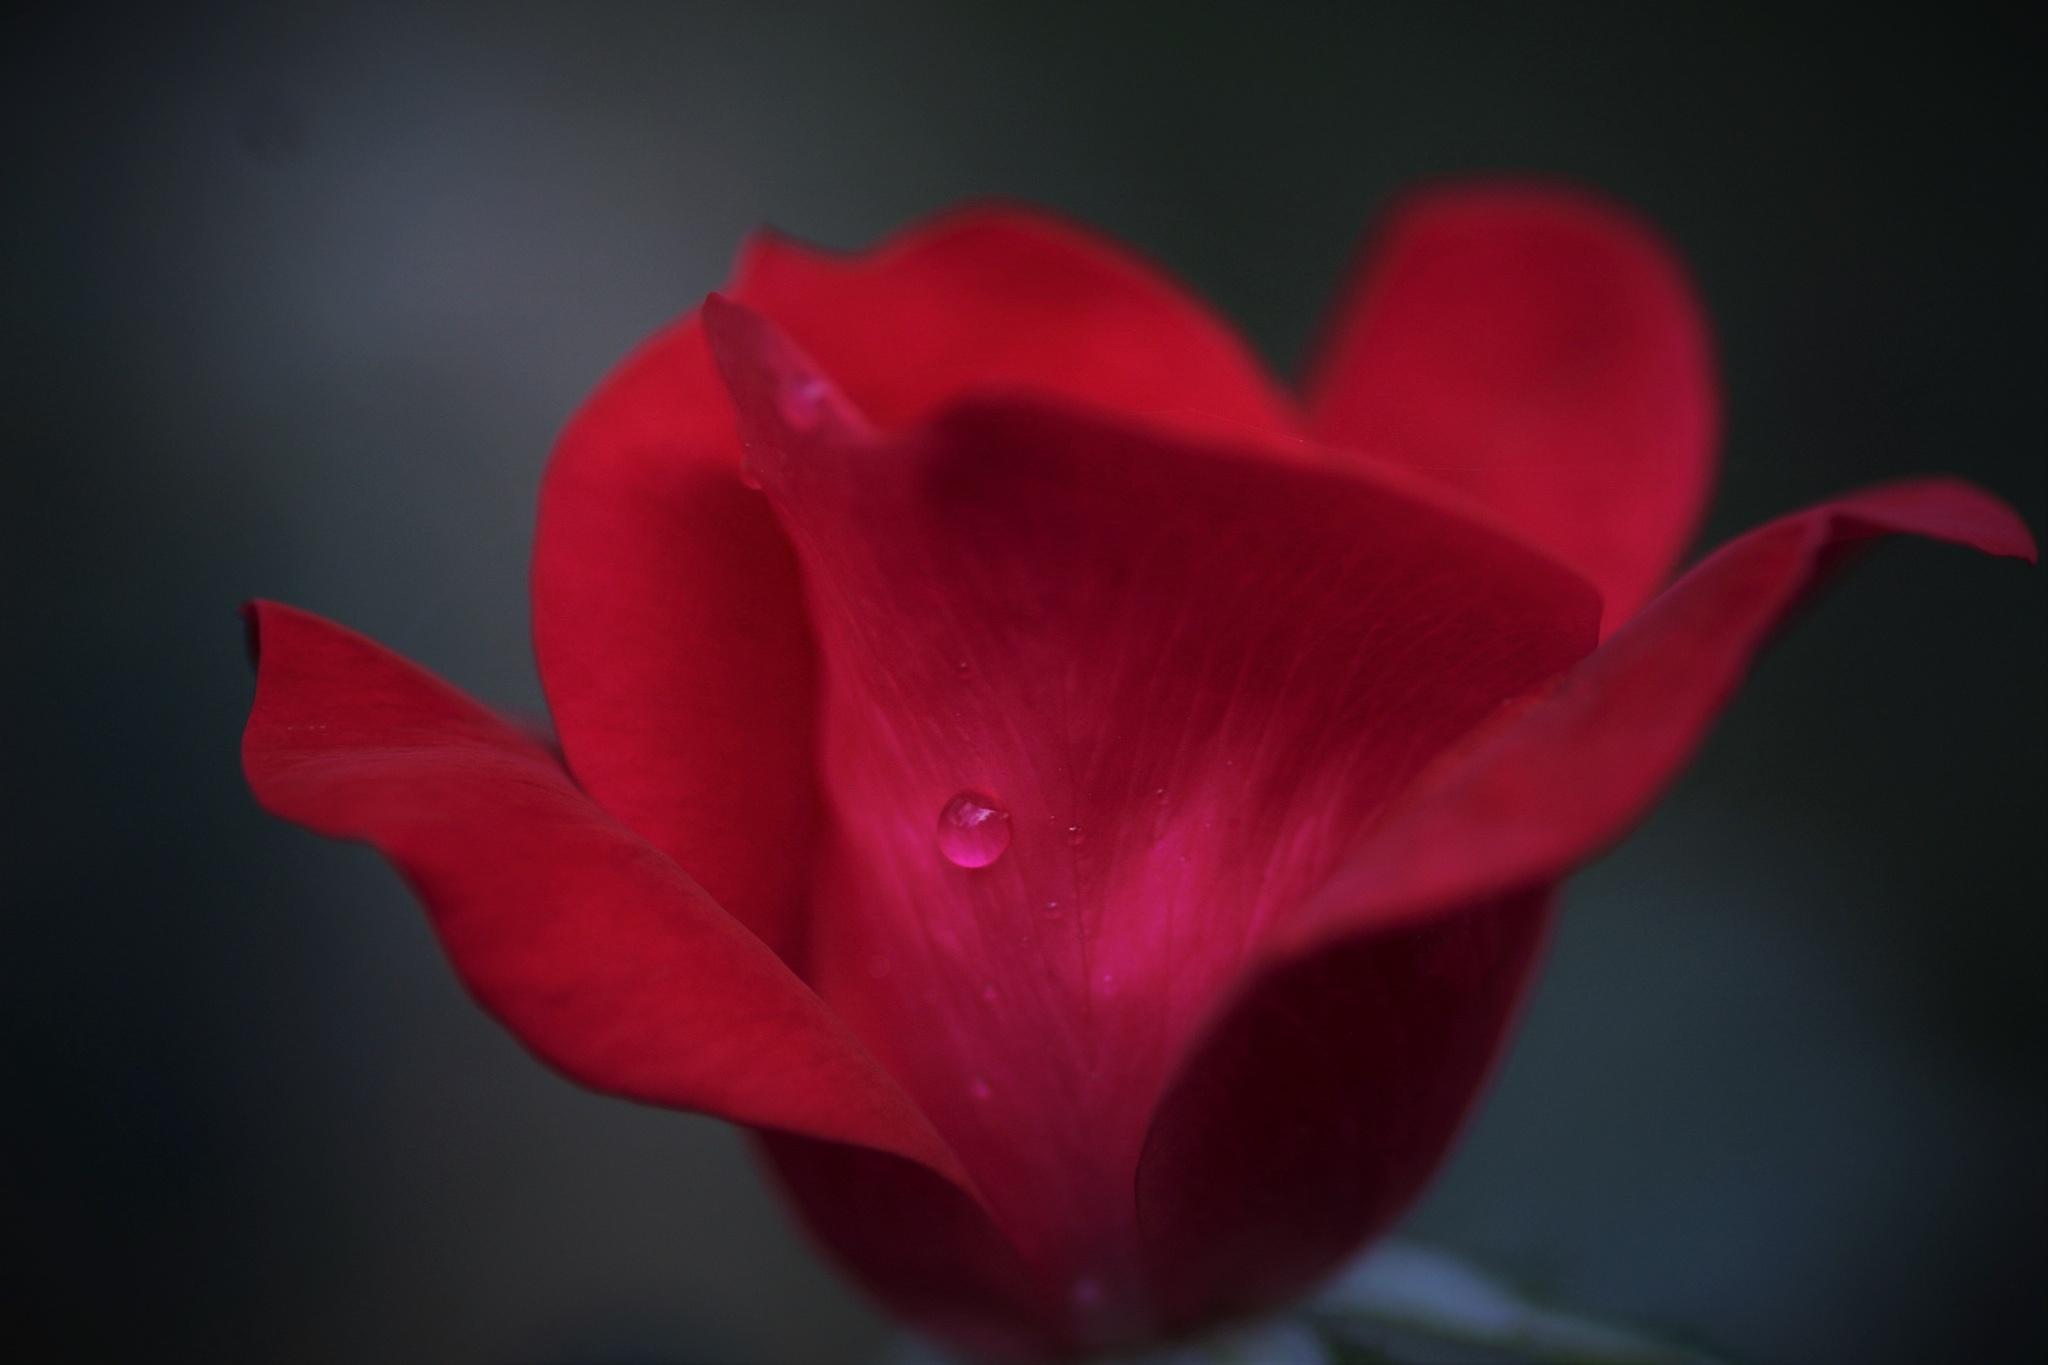 Dew drop by peterjohn